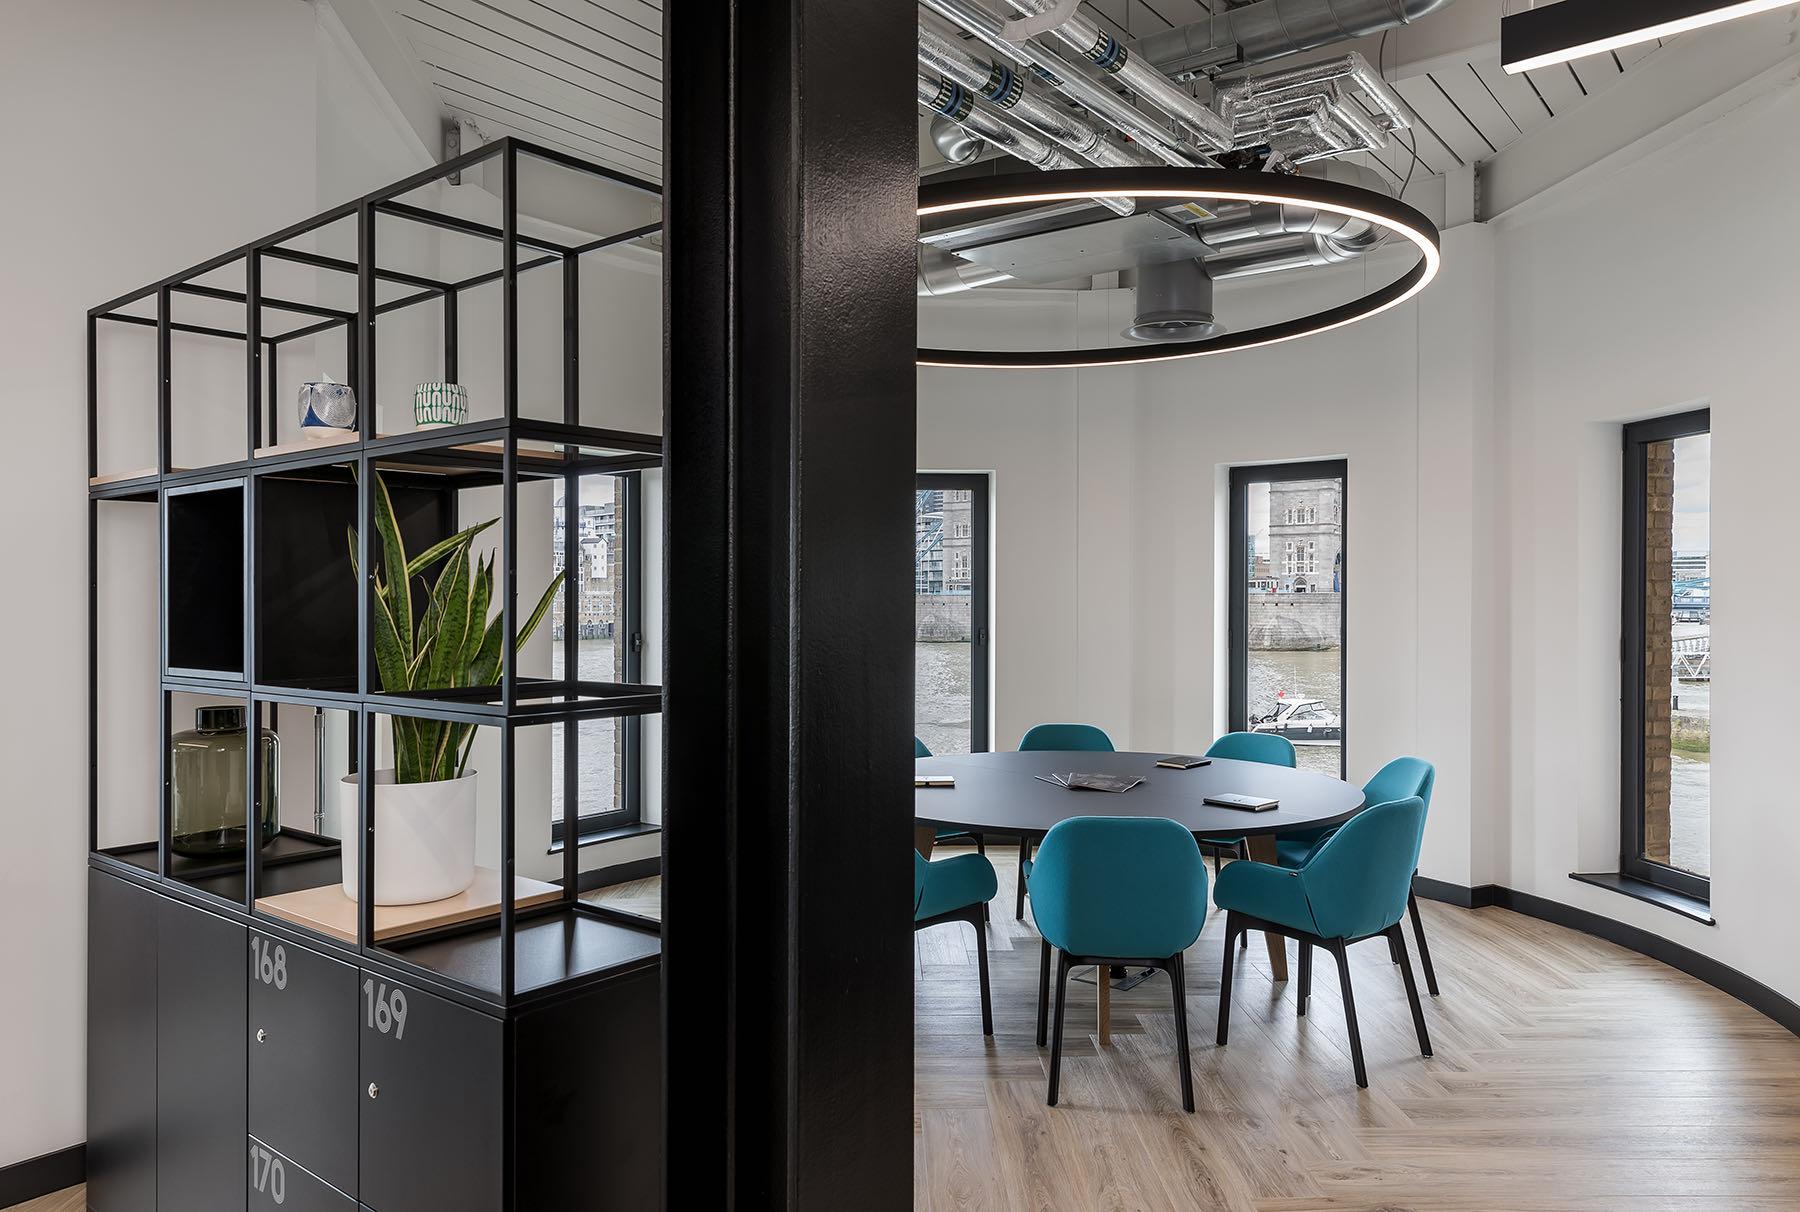 dynata-london-office-13